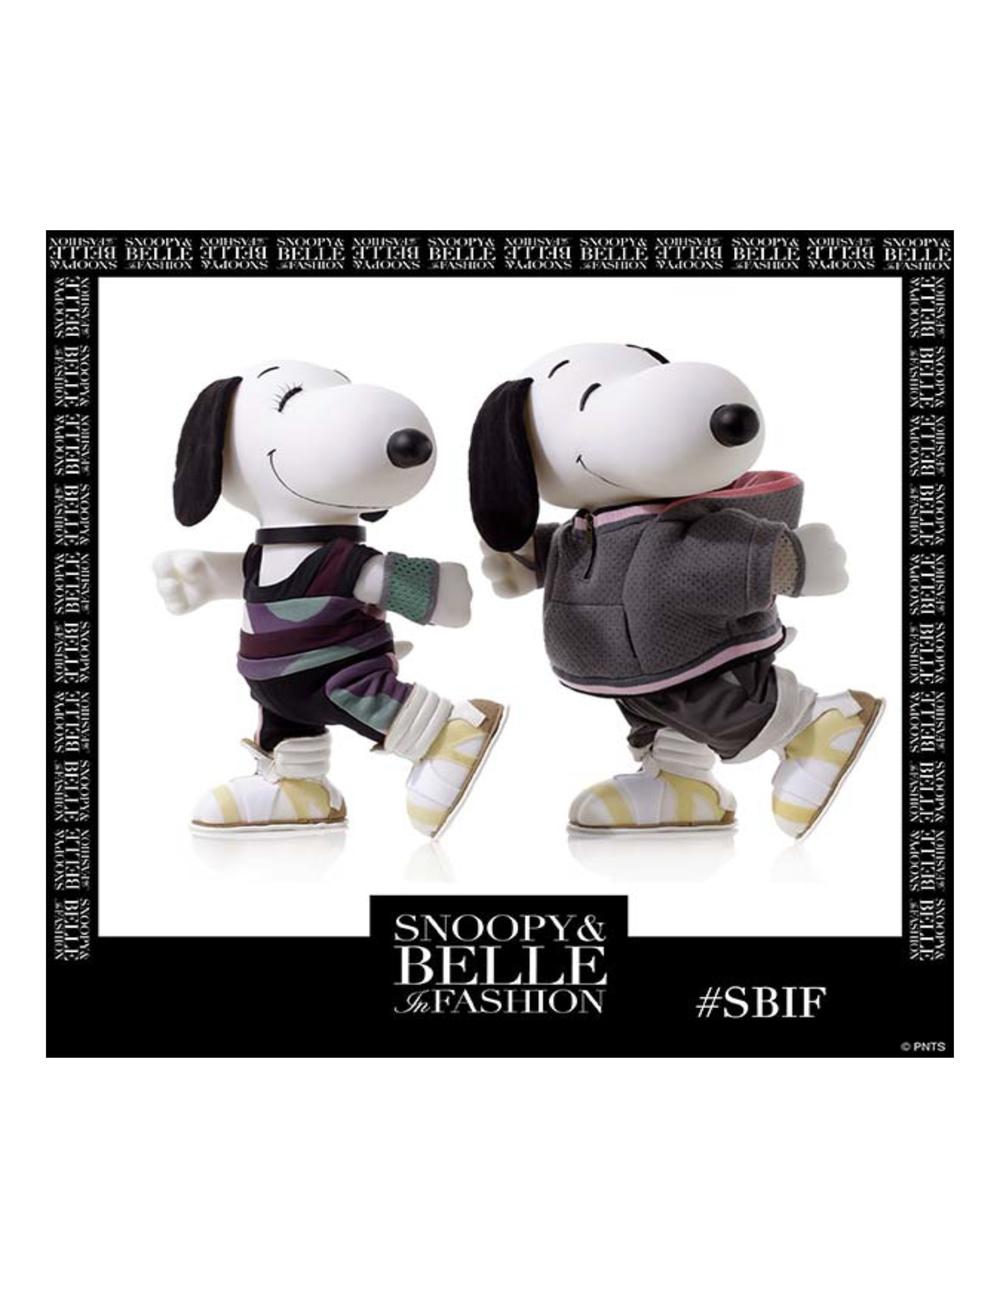 Snoopy & Belle 2015